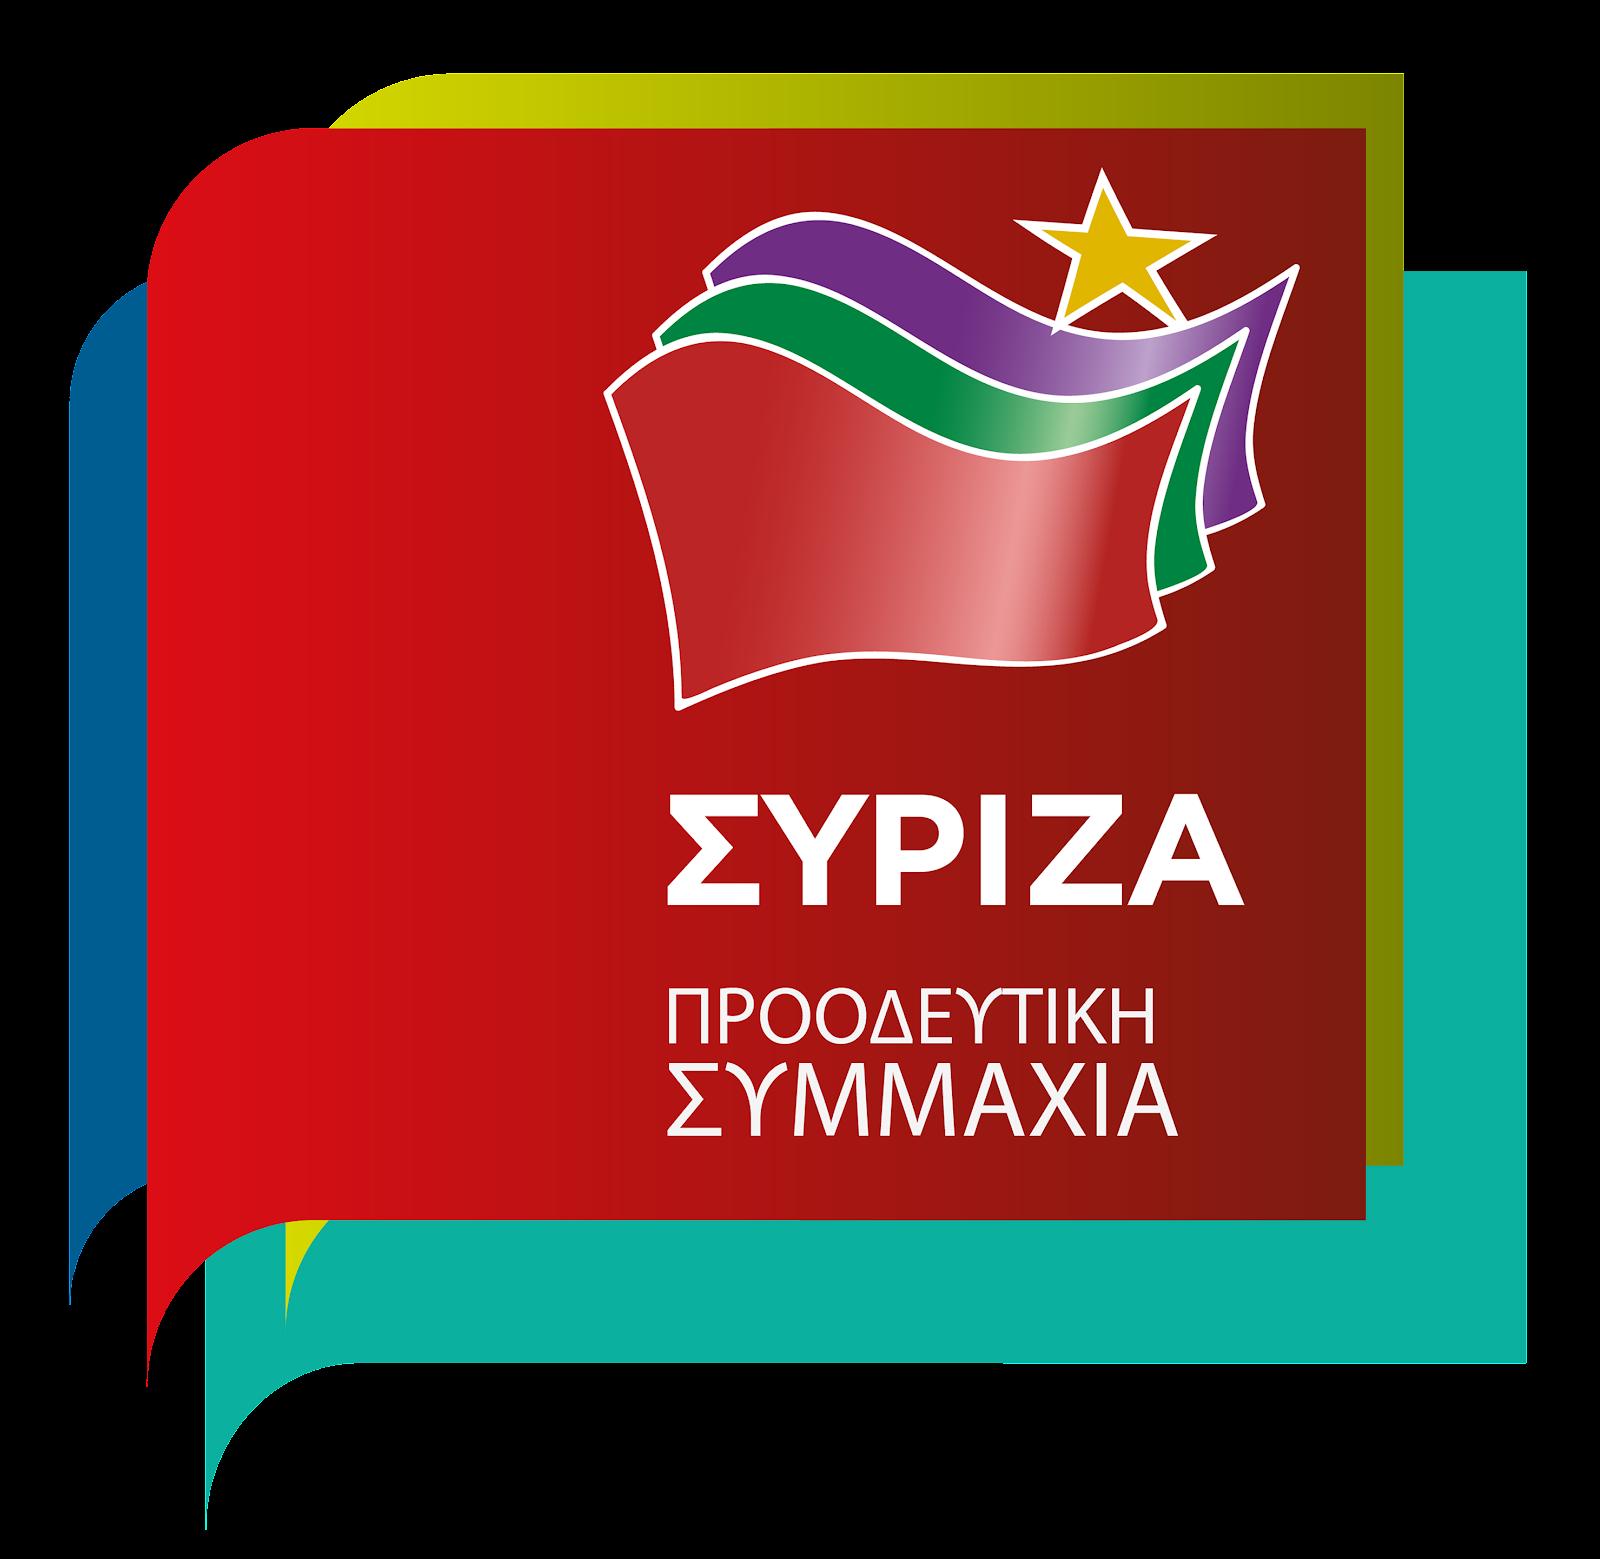 C:\Users\user\Pictures\ΣΥΡΙΖΑ 2019\logo_ΕΥΡΩΕΚΛΟΓΩΝ.png